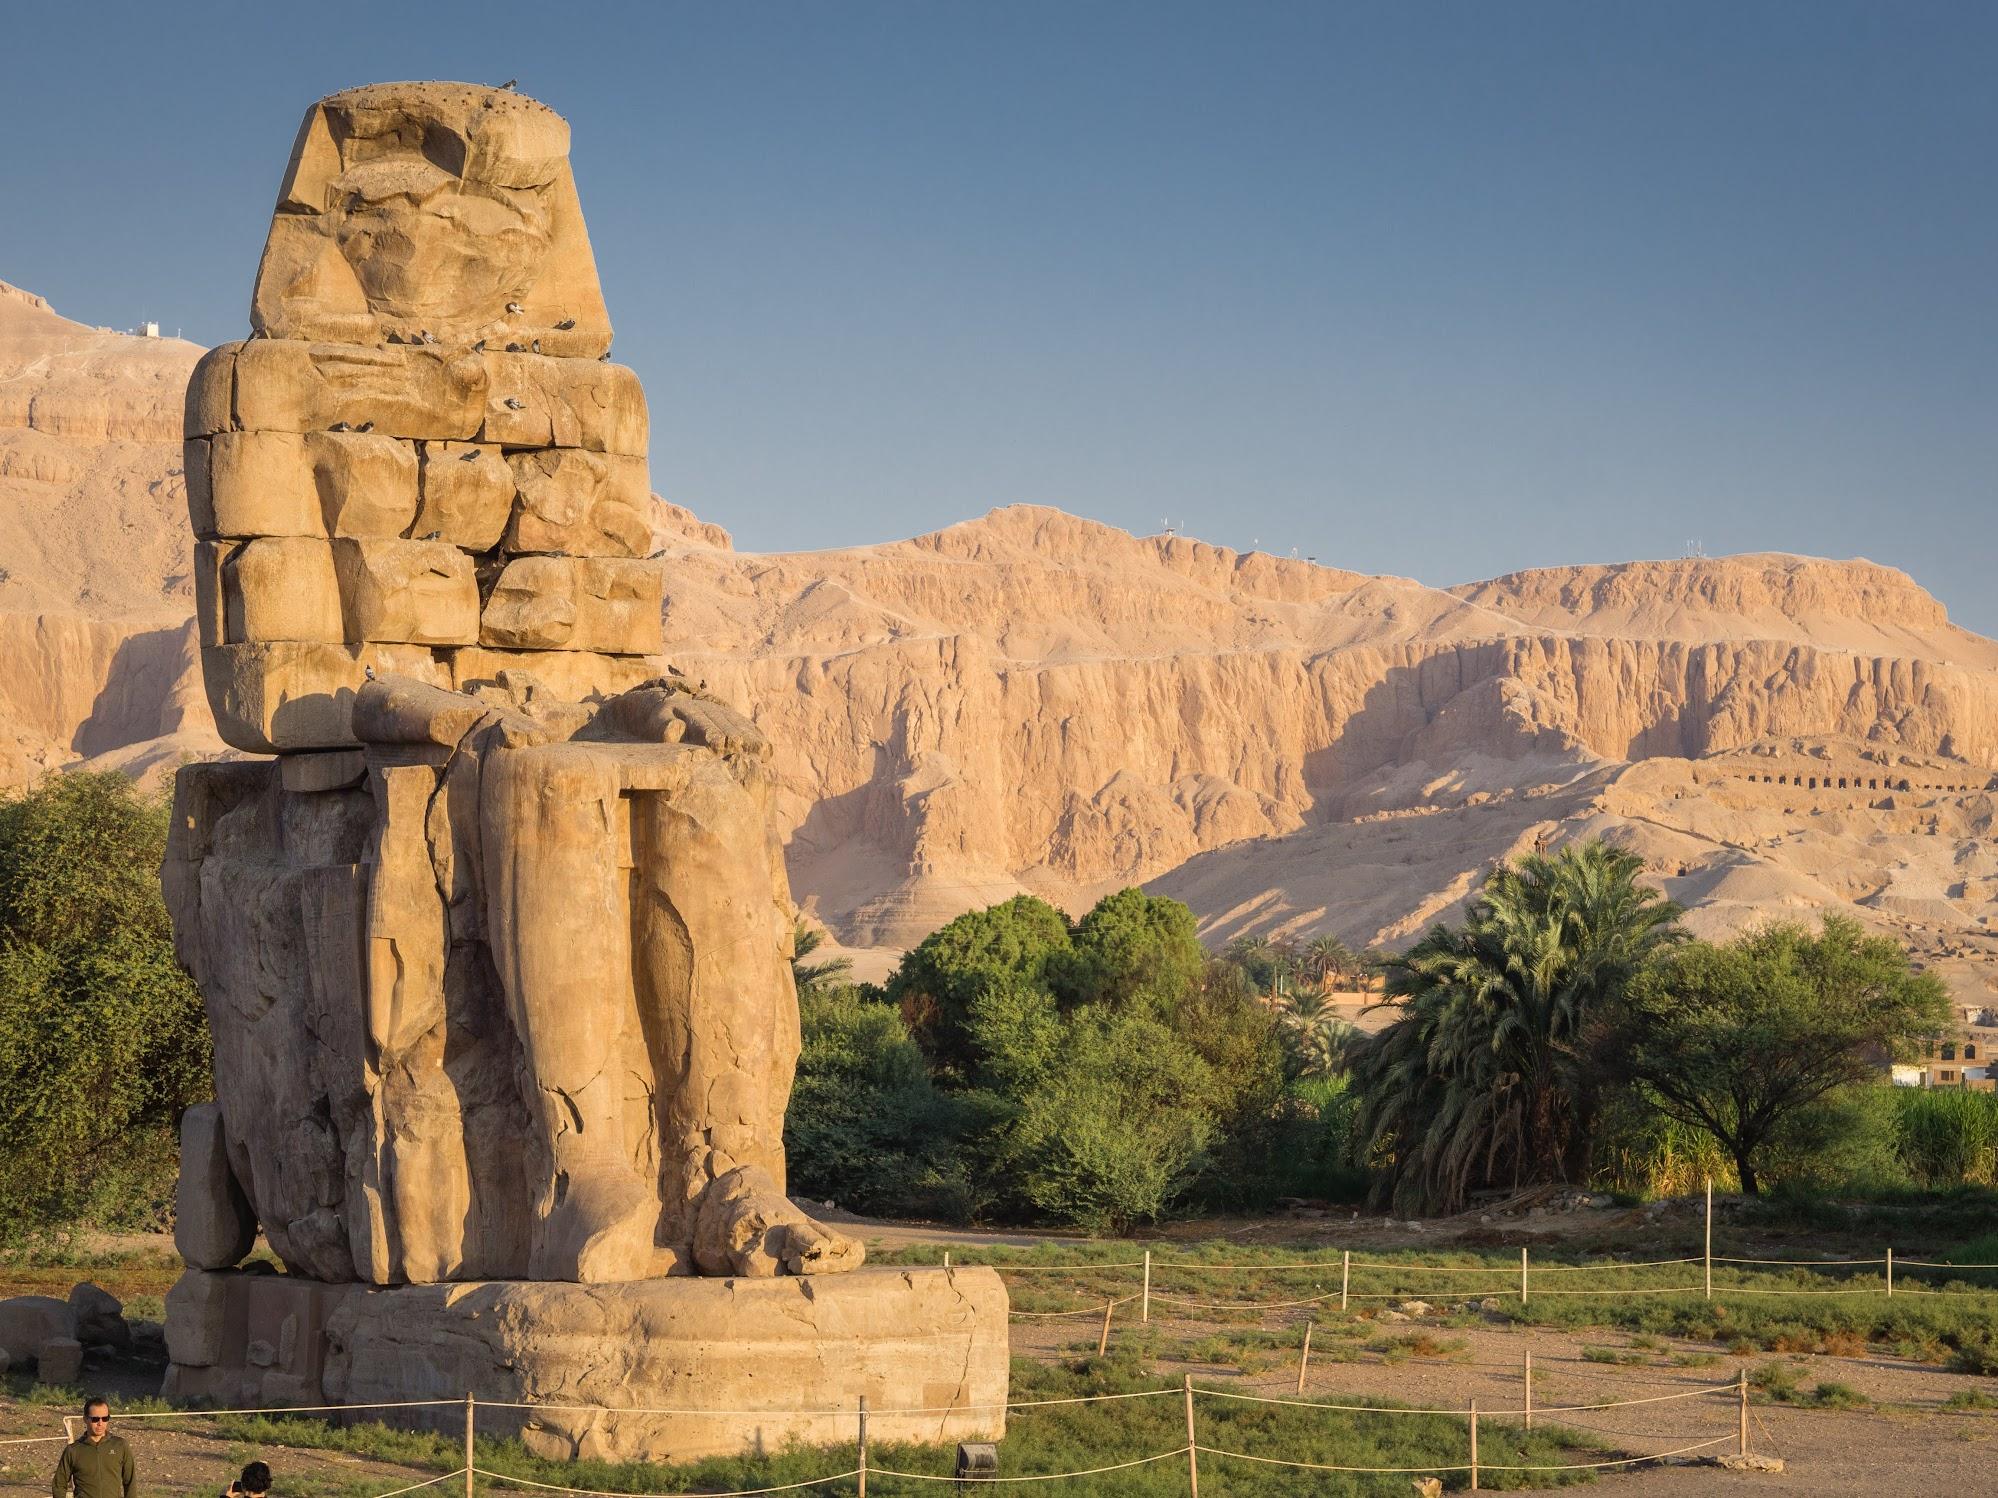 Colossi of Memnon against the desert mountain in Luxor